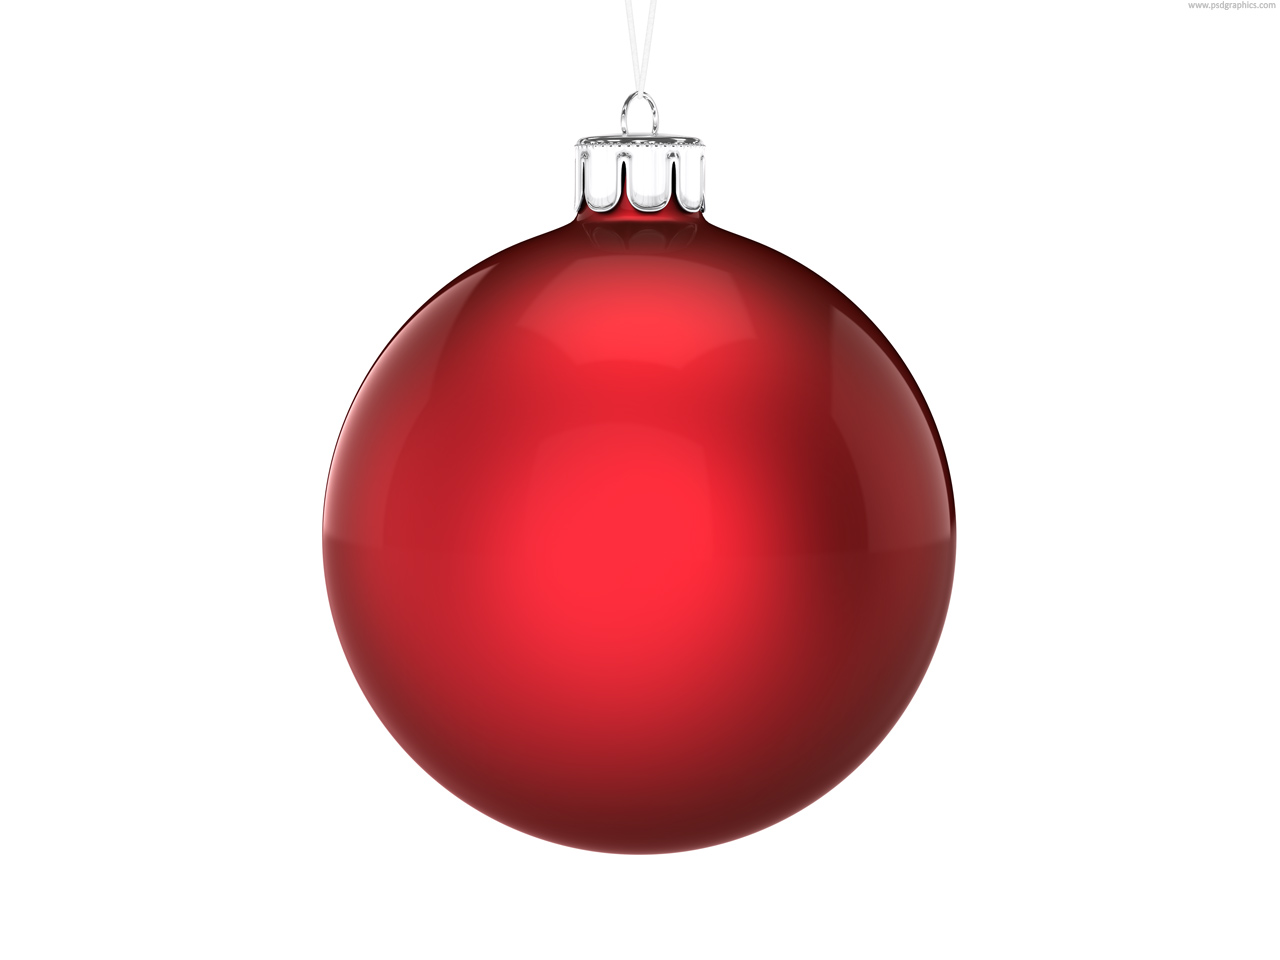 1280x960 Simple Christmas Ornaments Clip Art Is Santa Real